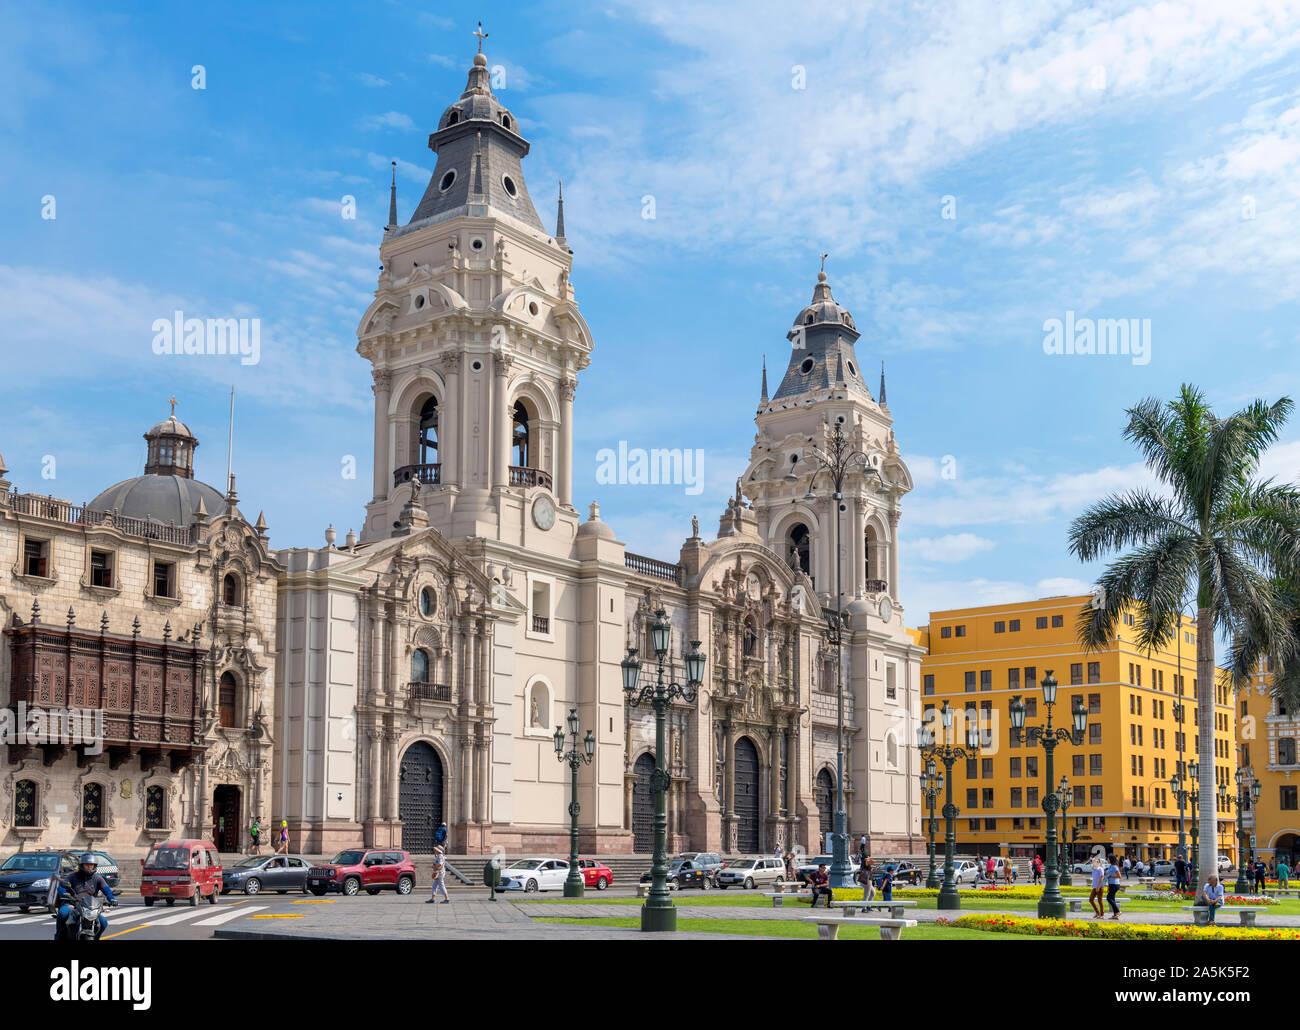 Lima Cathedral in the Plaza de Armas (Plaza Mayor), historic centre (centro historico), Lima, Peru, South America Stock Photo